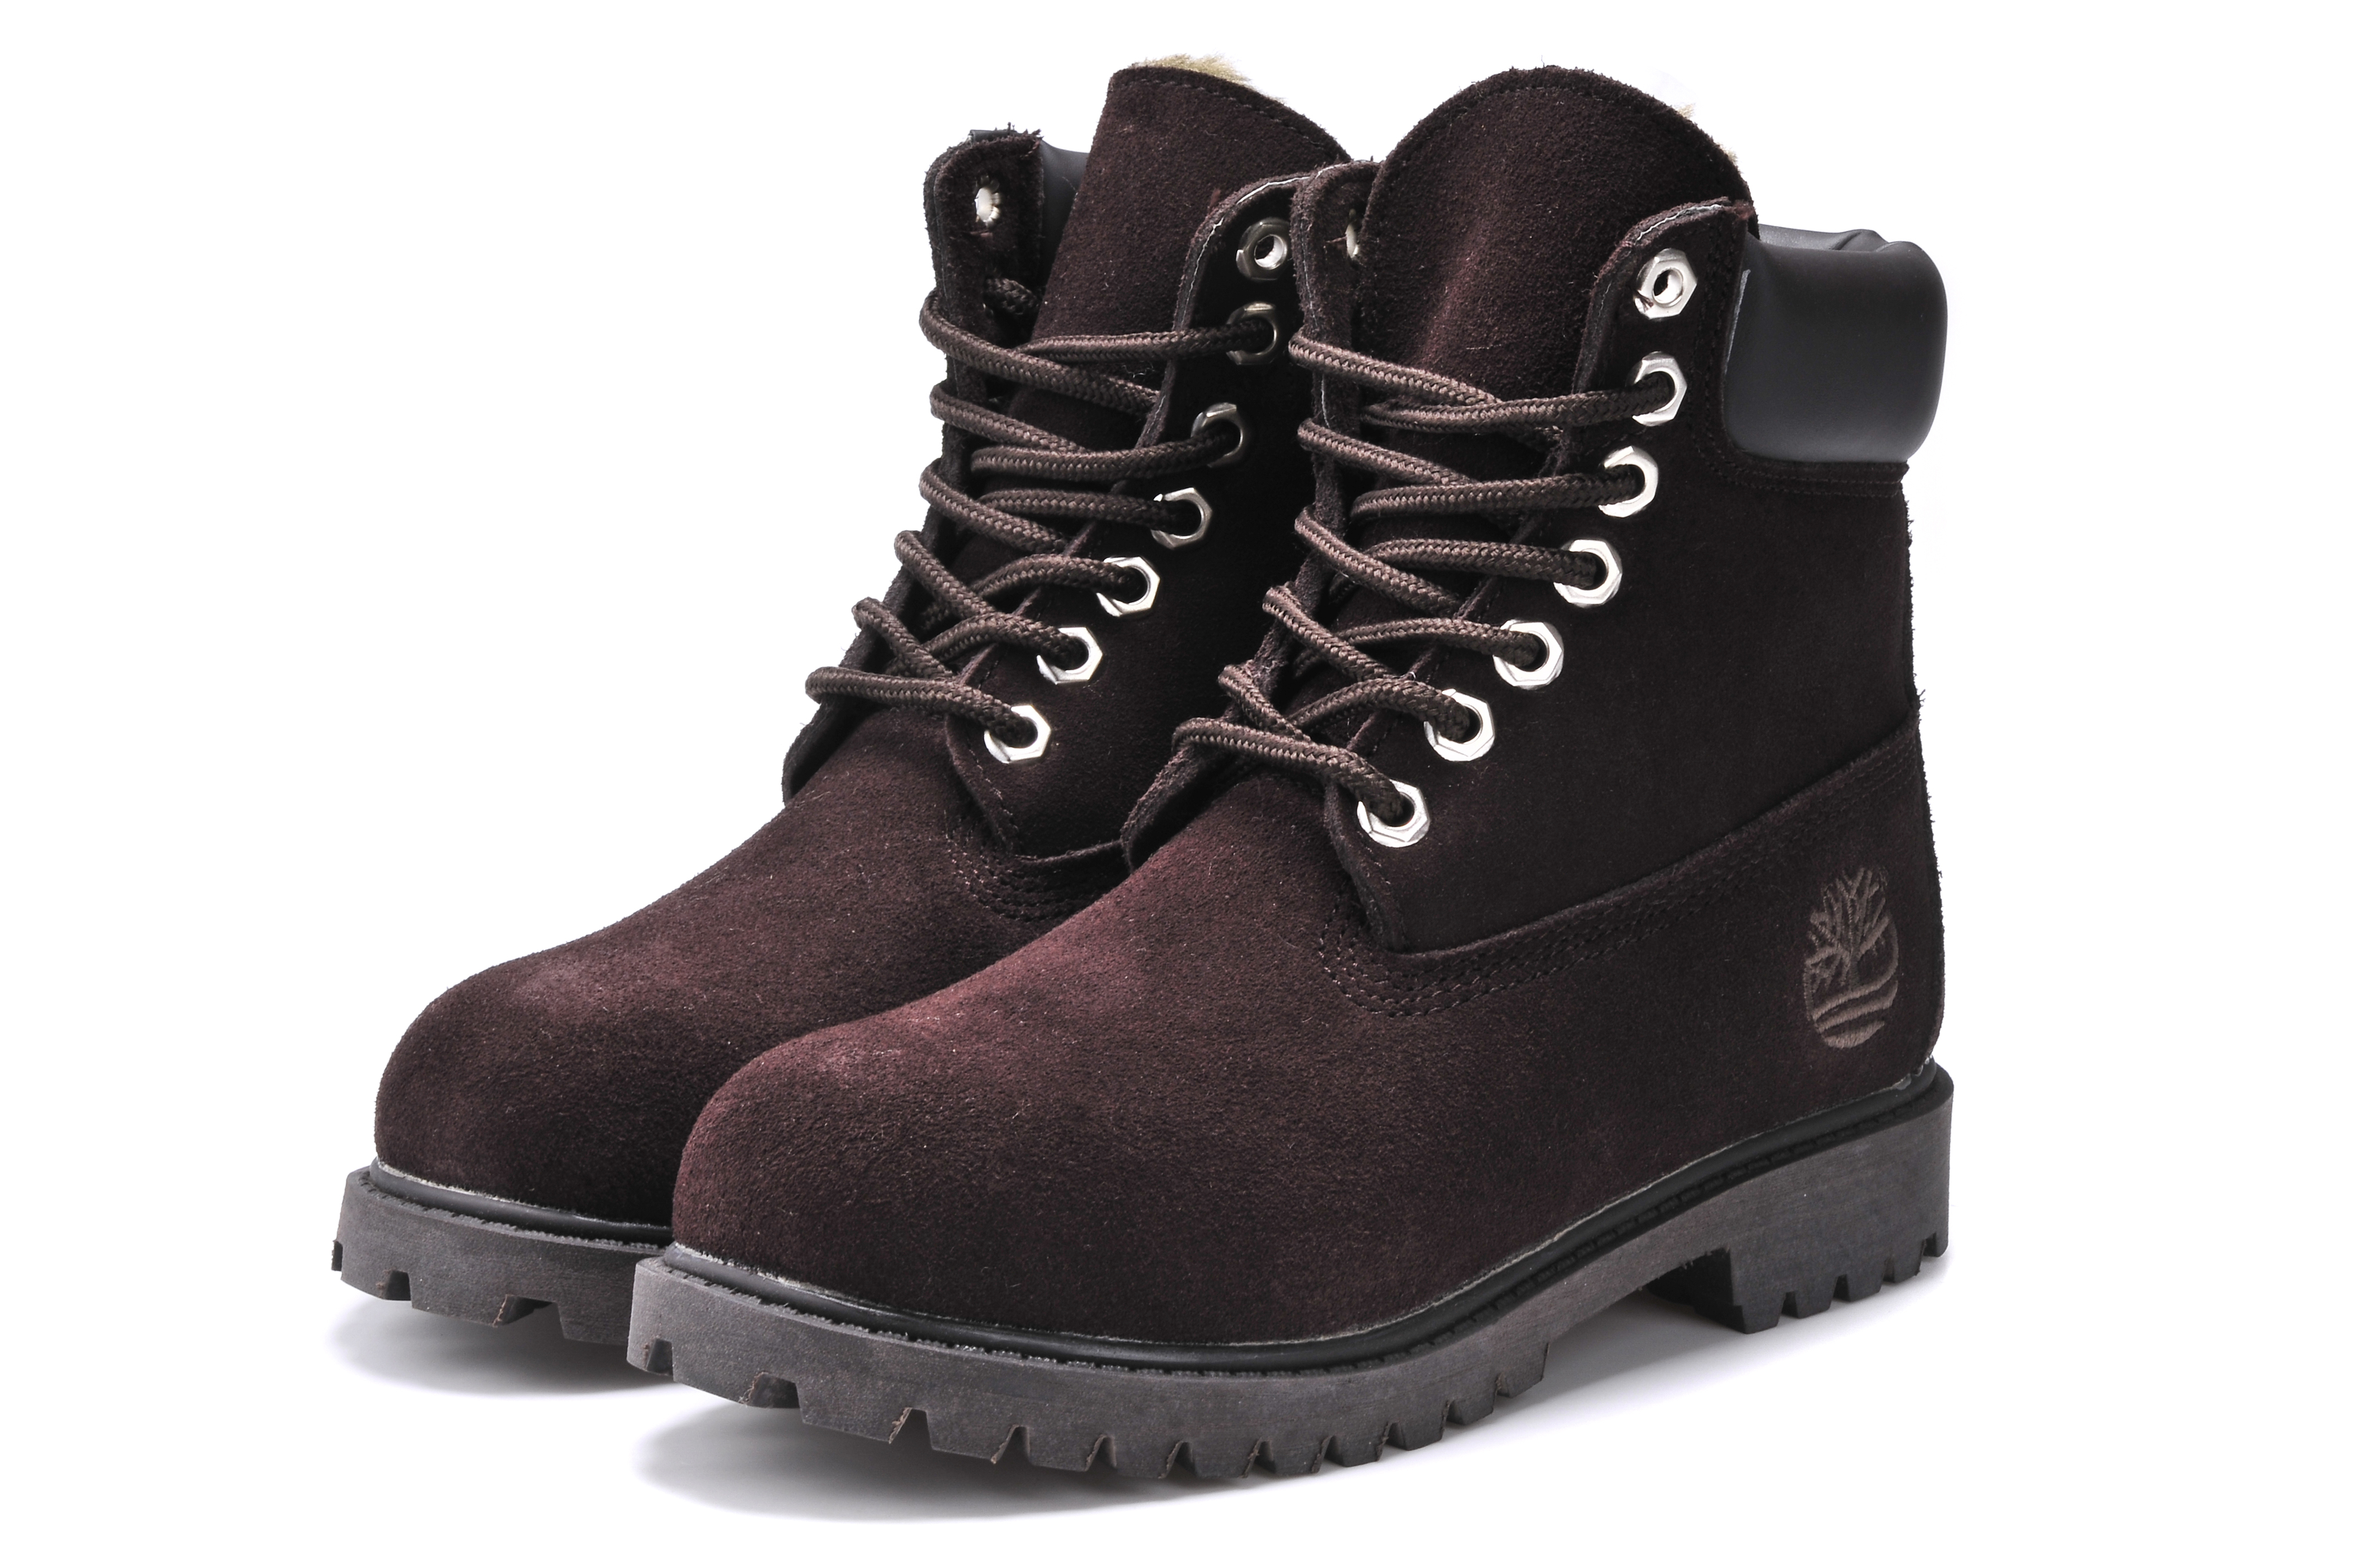 timberland homme soldes,timberland noir,chaussure timberlande